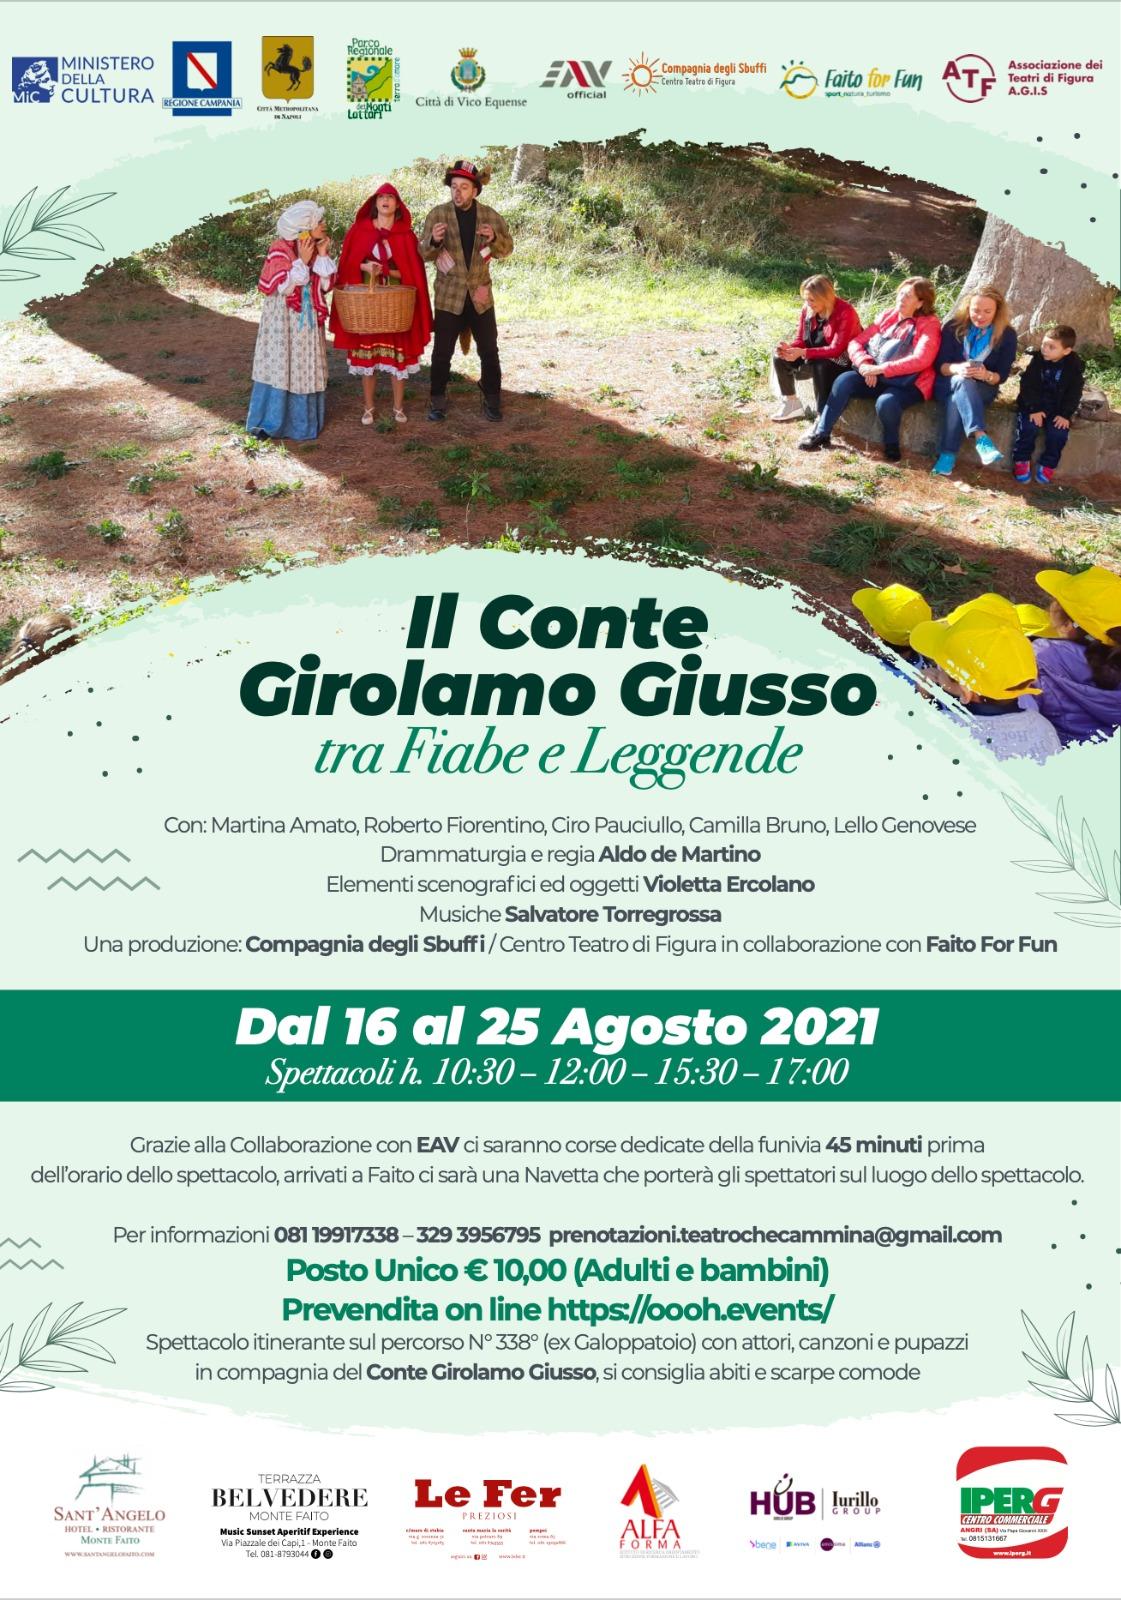 Il Conte Girolamo Giusso tra Fiabe e Leggende